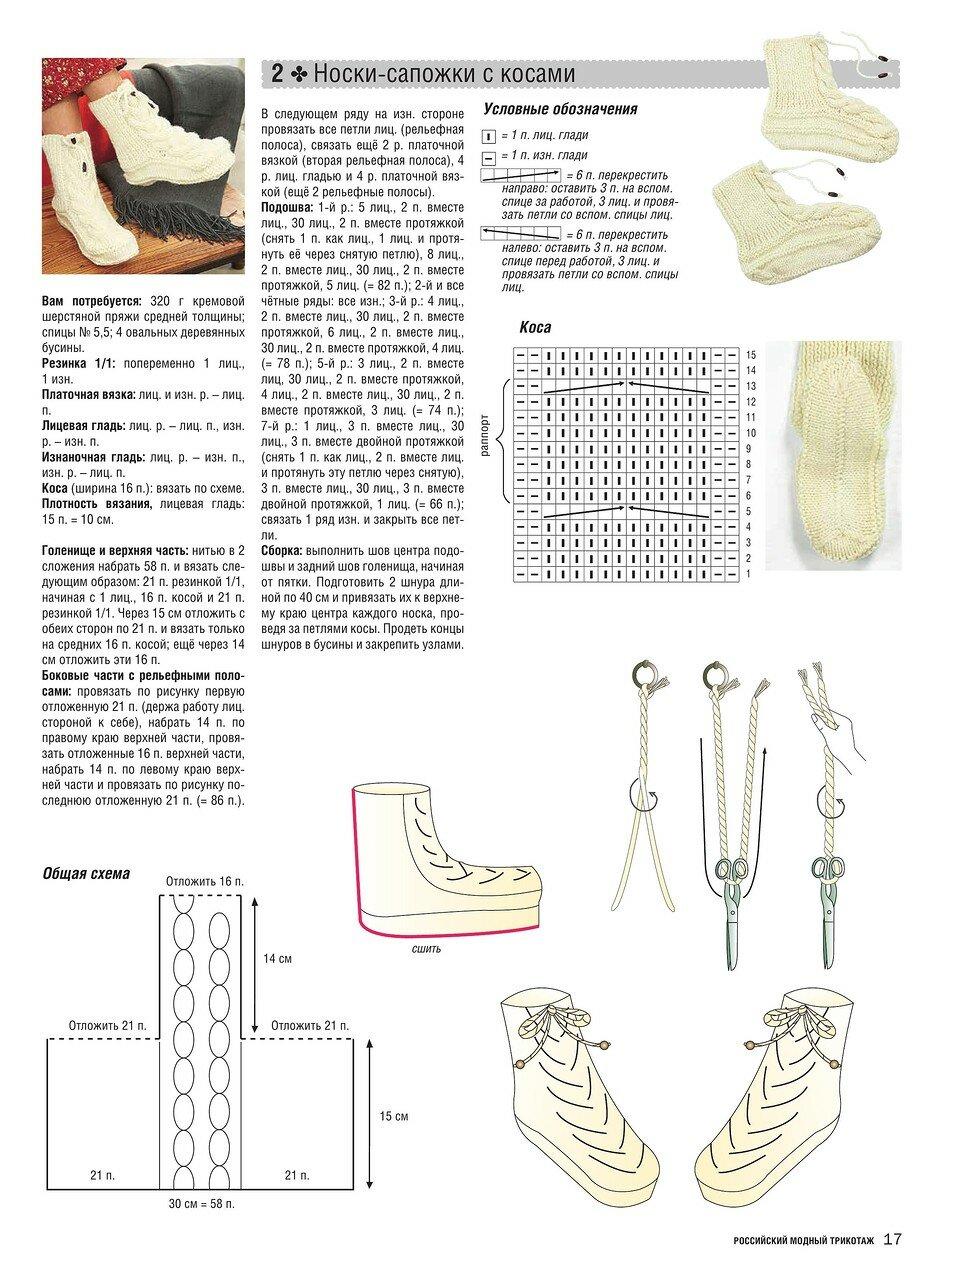 Тапочки и сапожки крючком с описанием и схемами